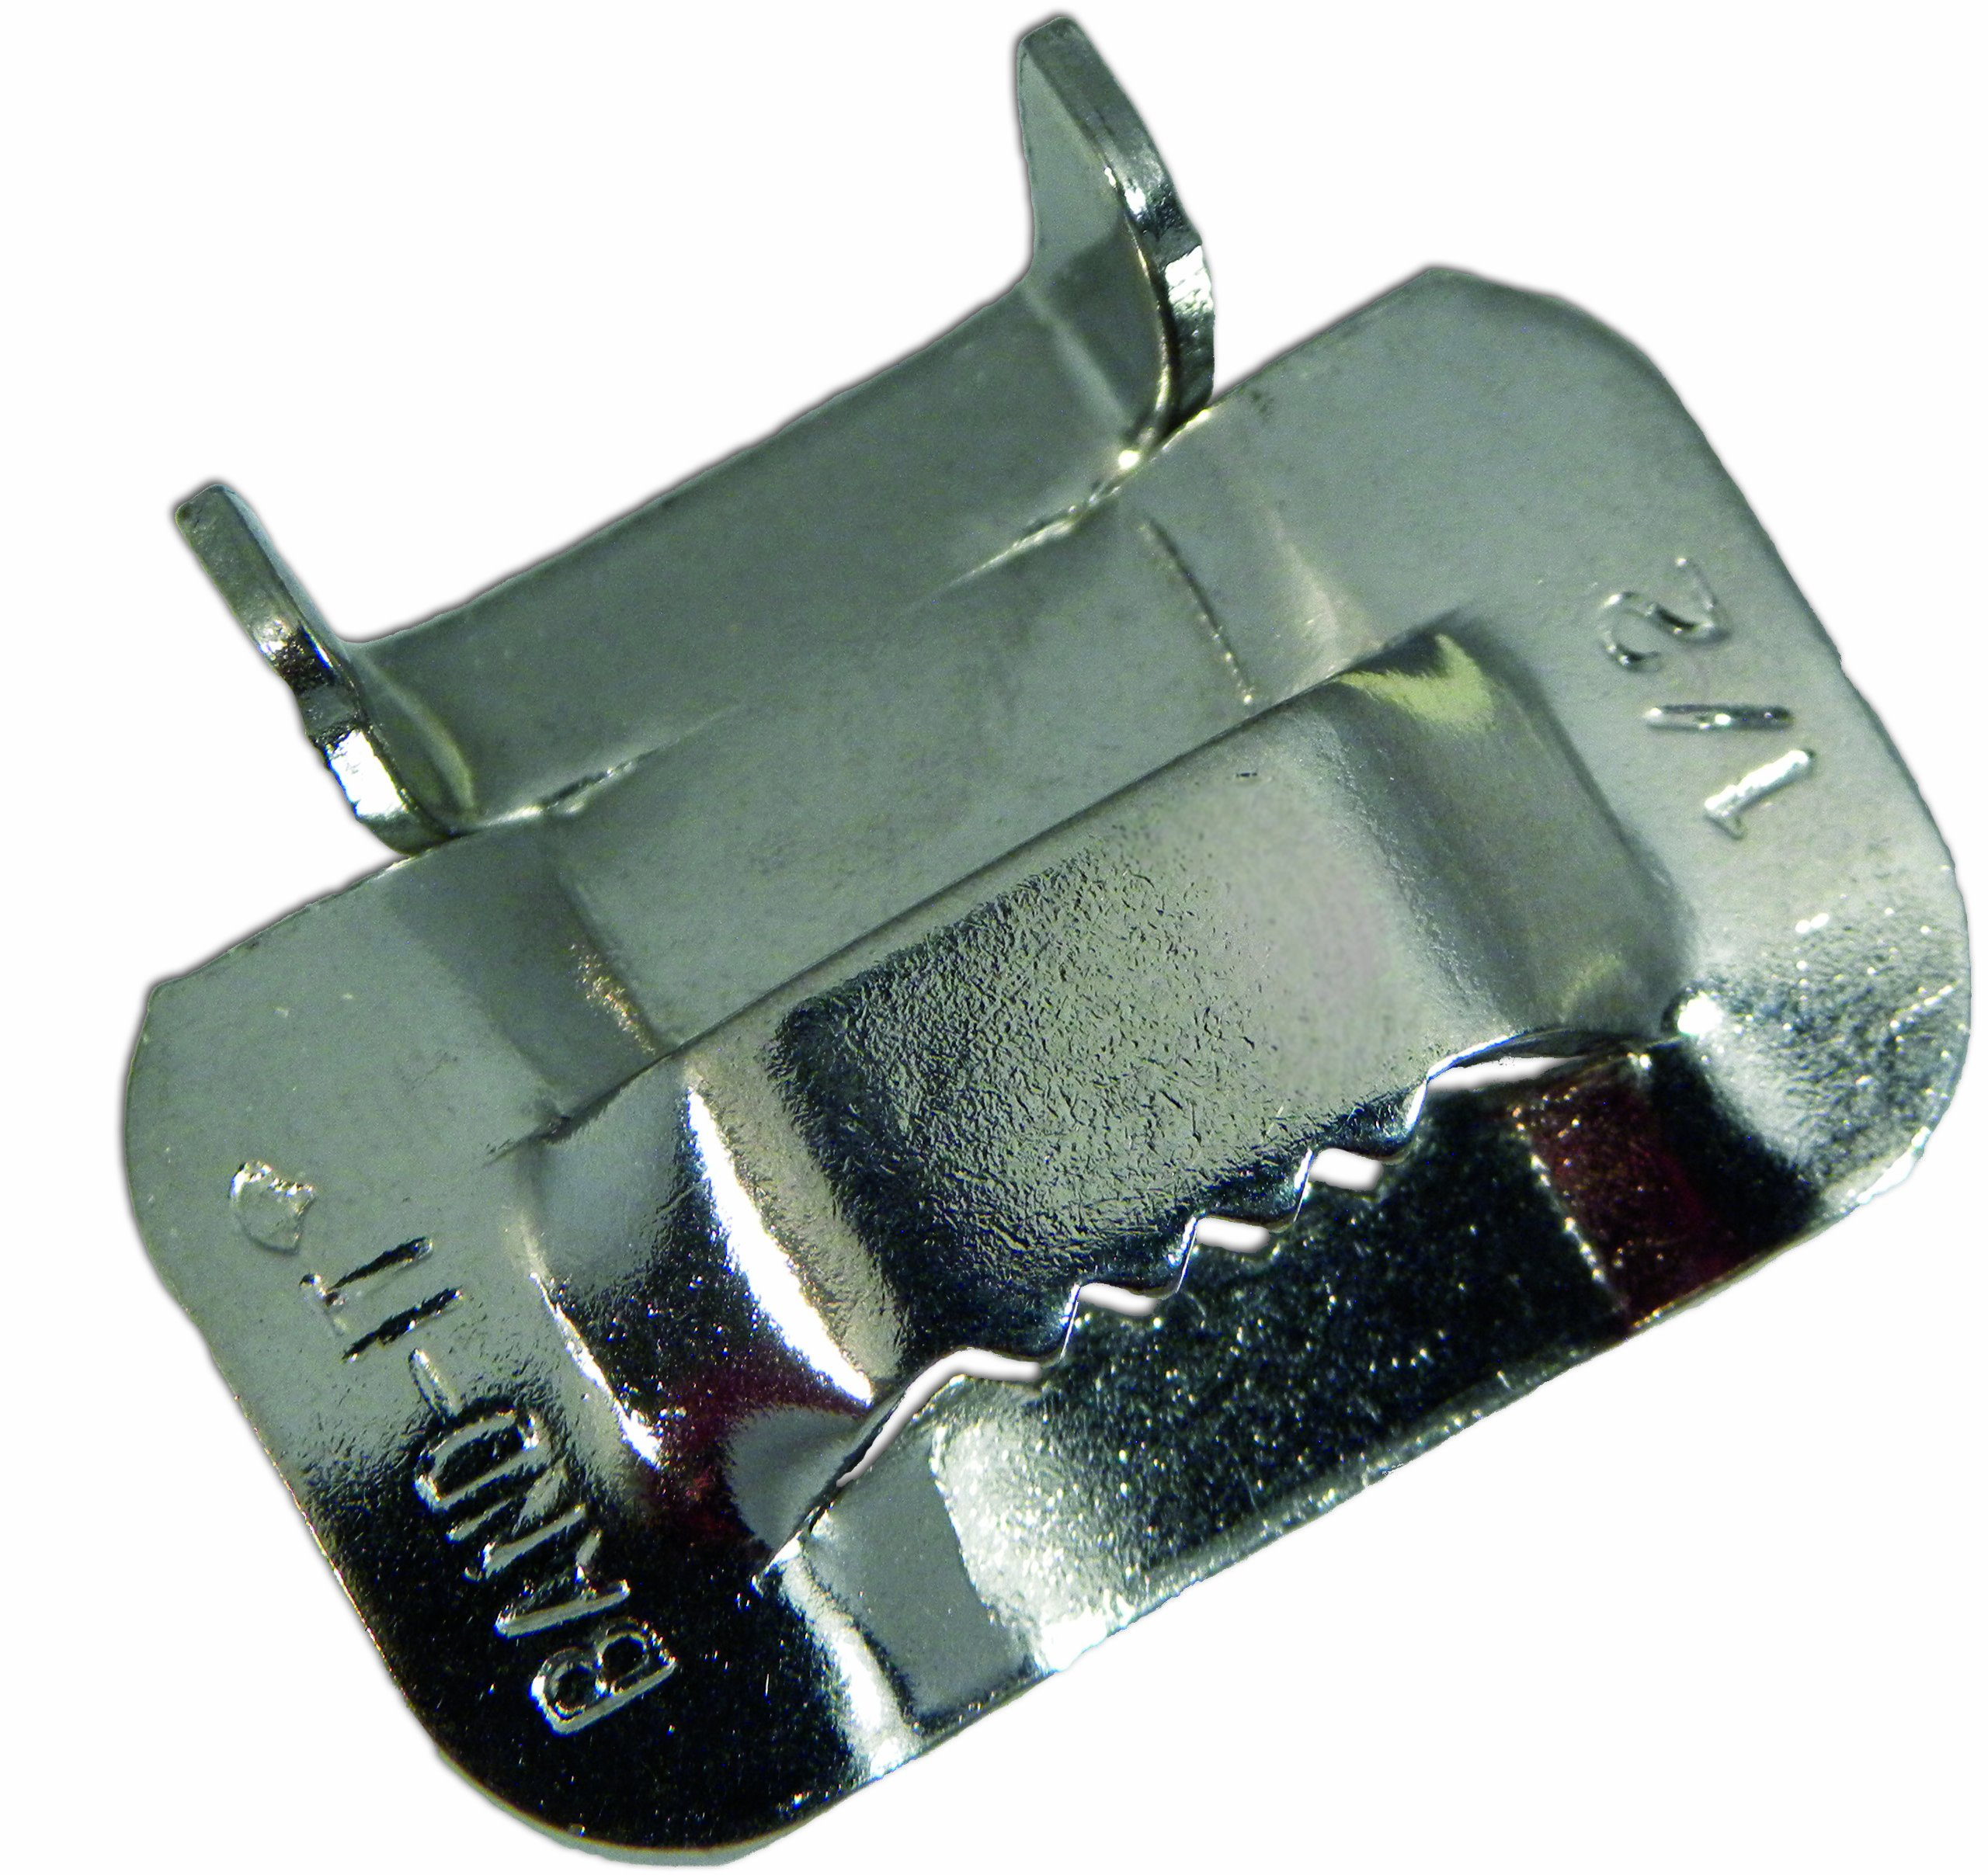 "BAND-IT C25499 201/301 Stainless Steel Ear-Lokt Buckle, 1/2"" Width, 100 per Box"